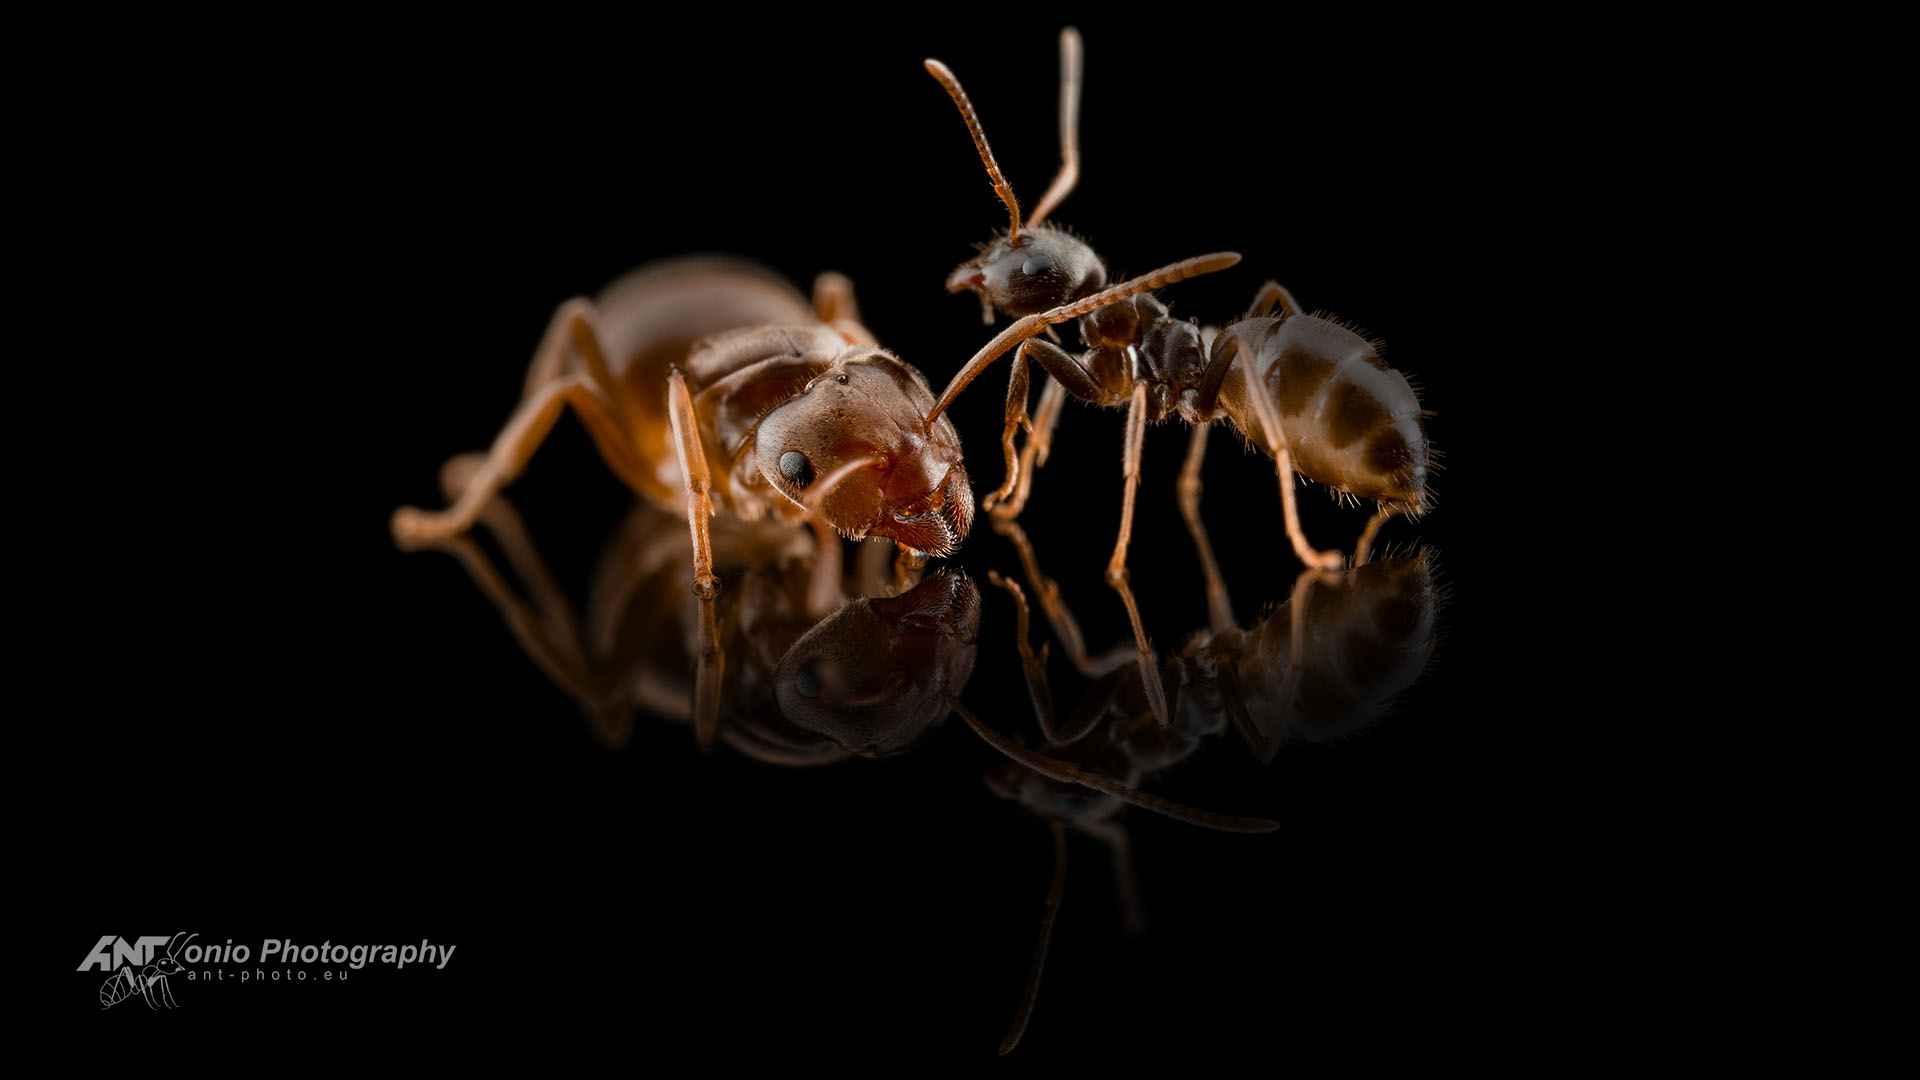 Chthonolasius ants